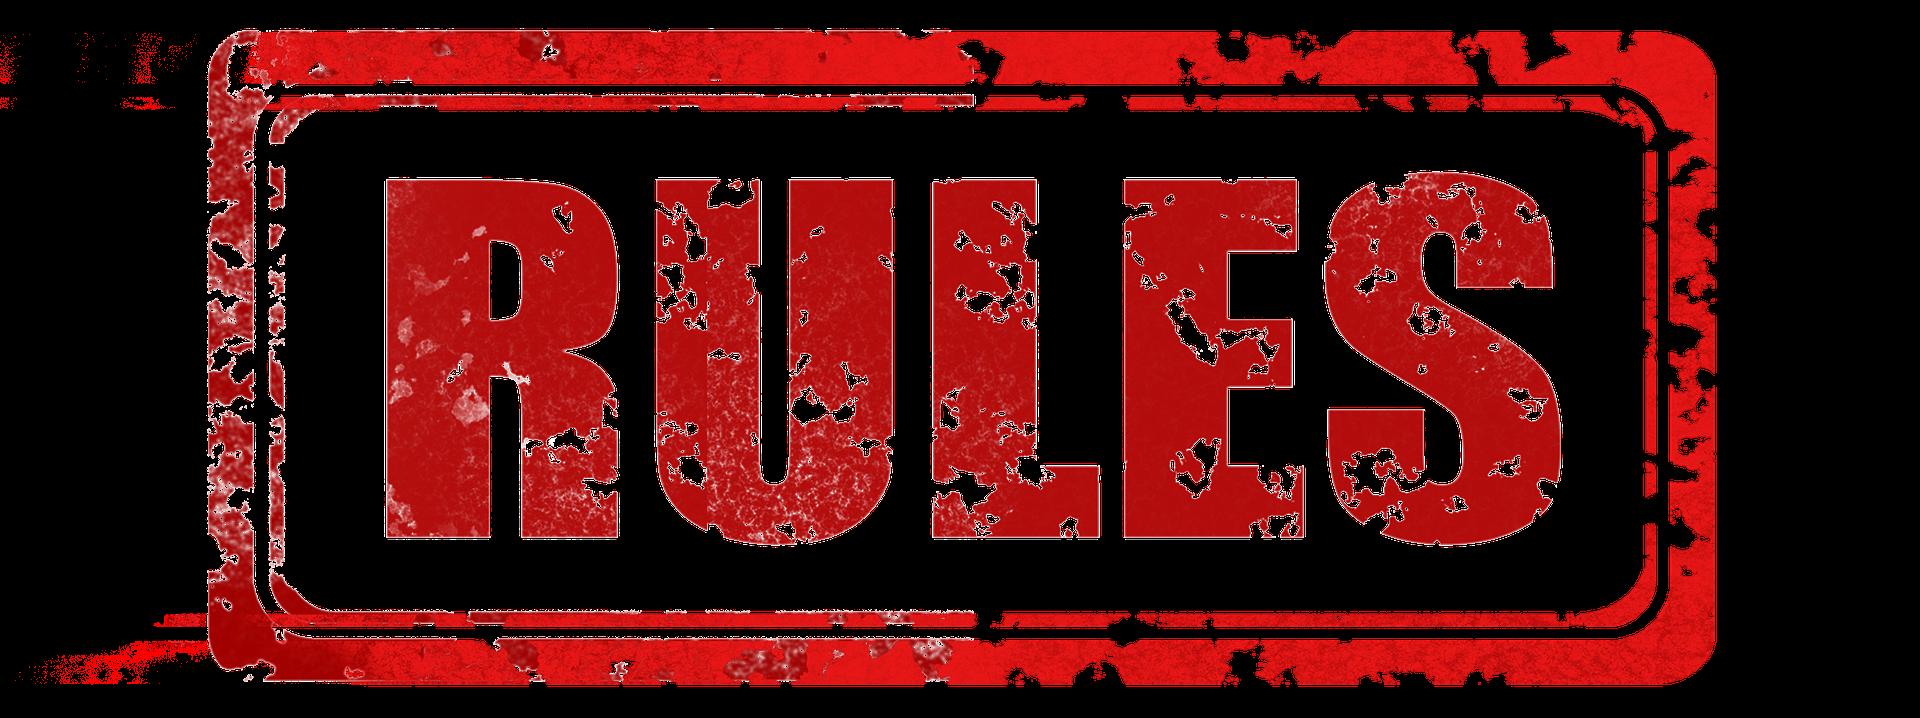 rule-1752536_1920